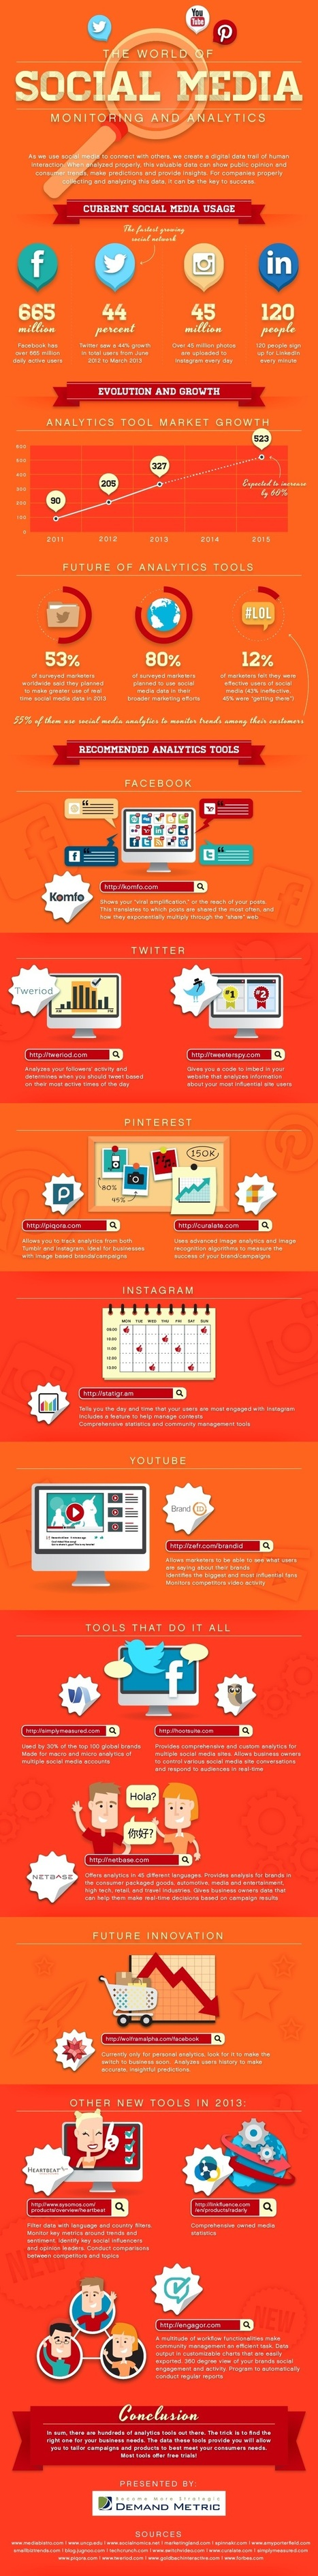 The World of Social Media Monitoring and Analytics [Infographic] | Social Media Monitoring | Scoop.it